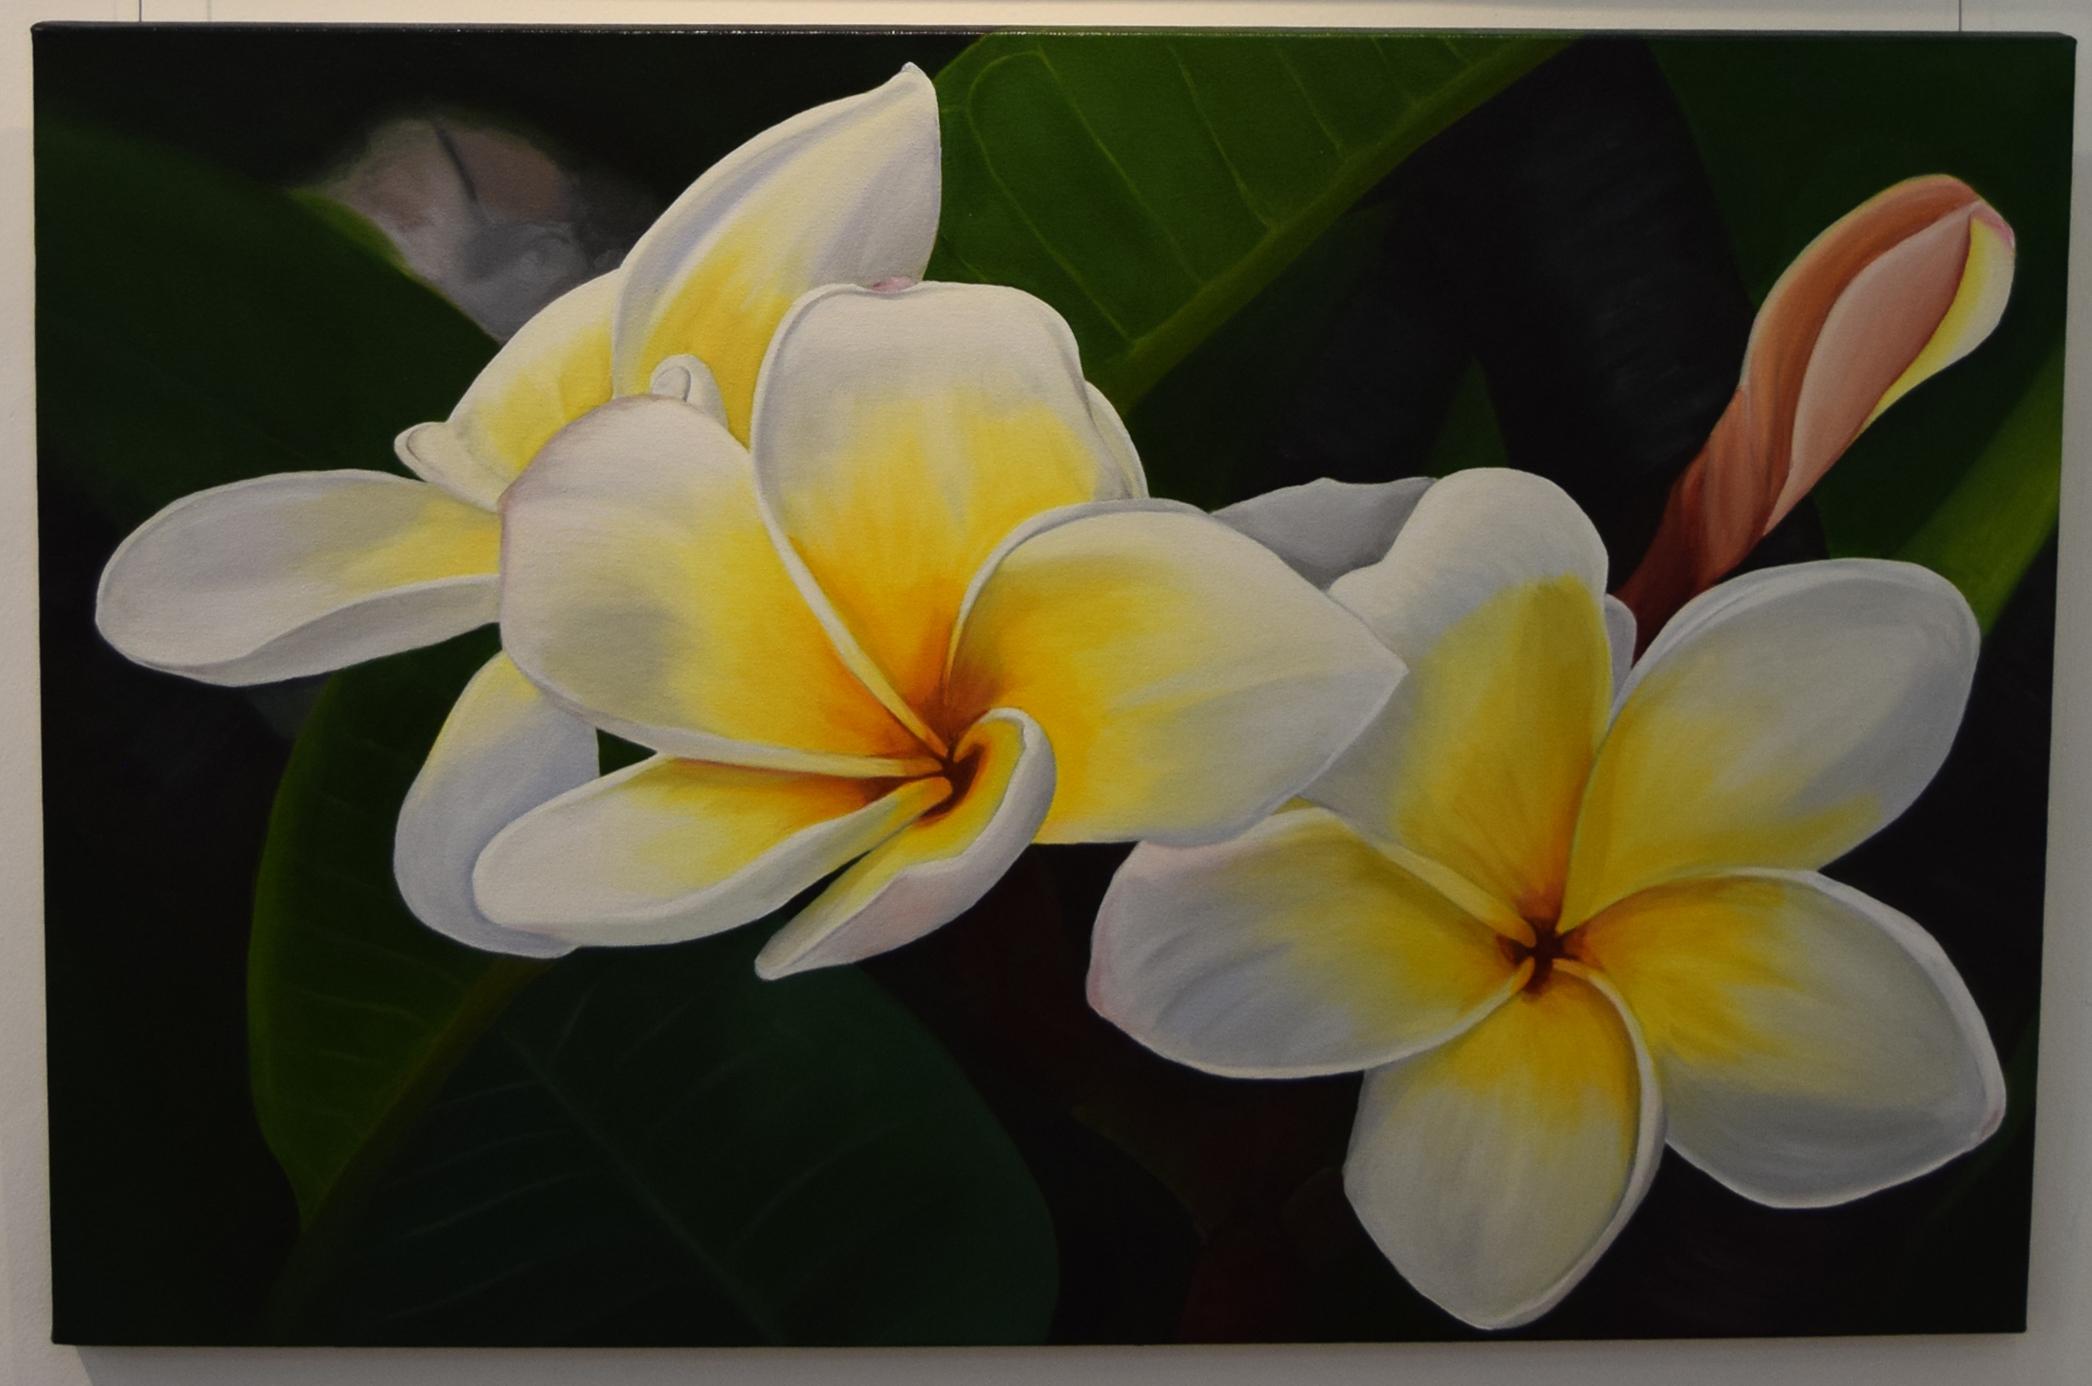 6. Hayley Krüger Gradwell, Scent of Summer, 2018, acrylic on canvas, 61 x 91 cm, $850